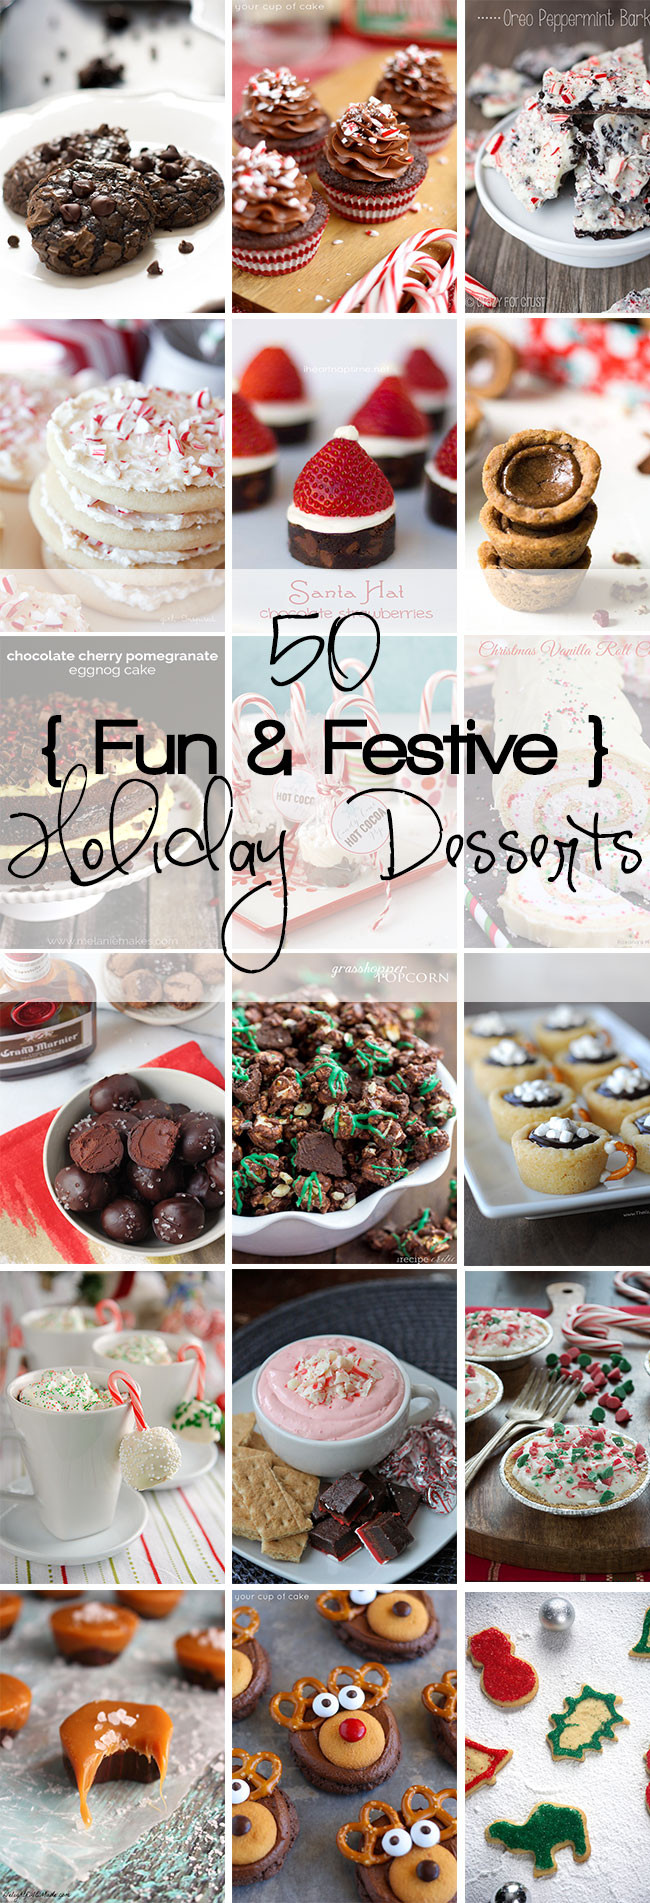 Festive Christmas Desserts  50 Fun & Festive Holiday Desserts